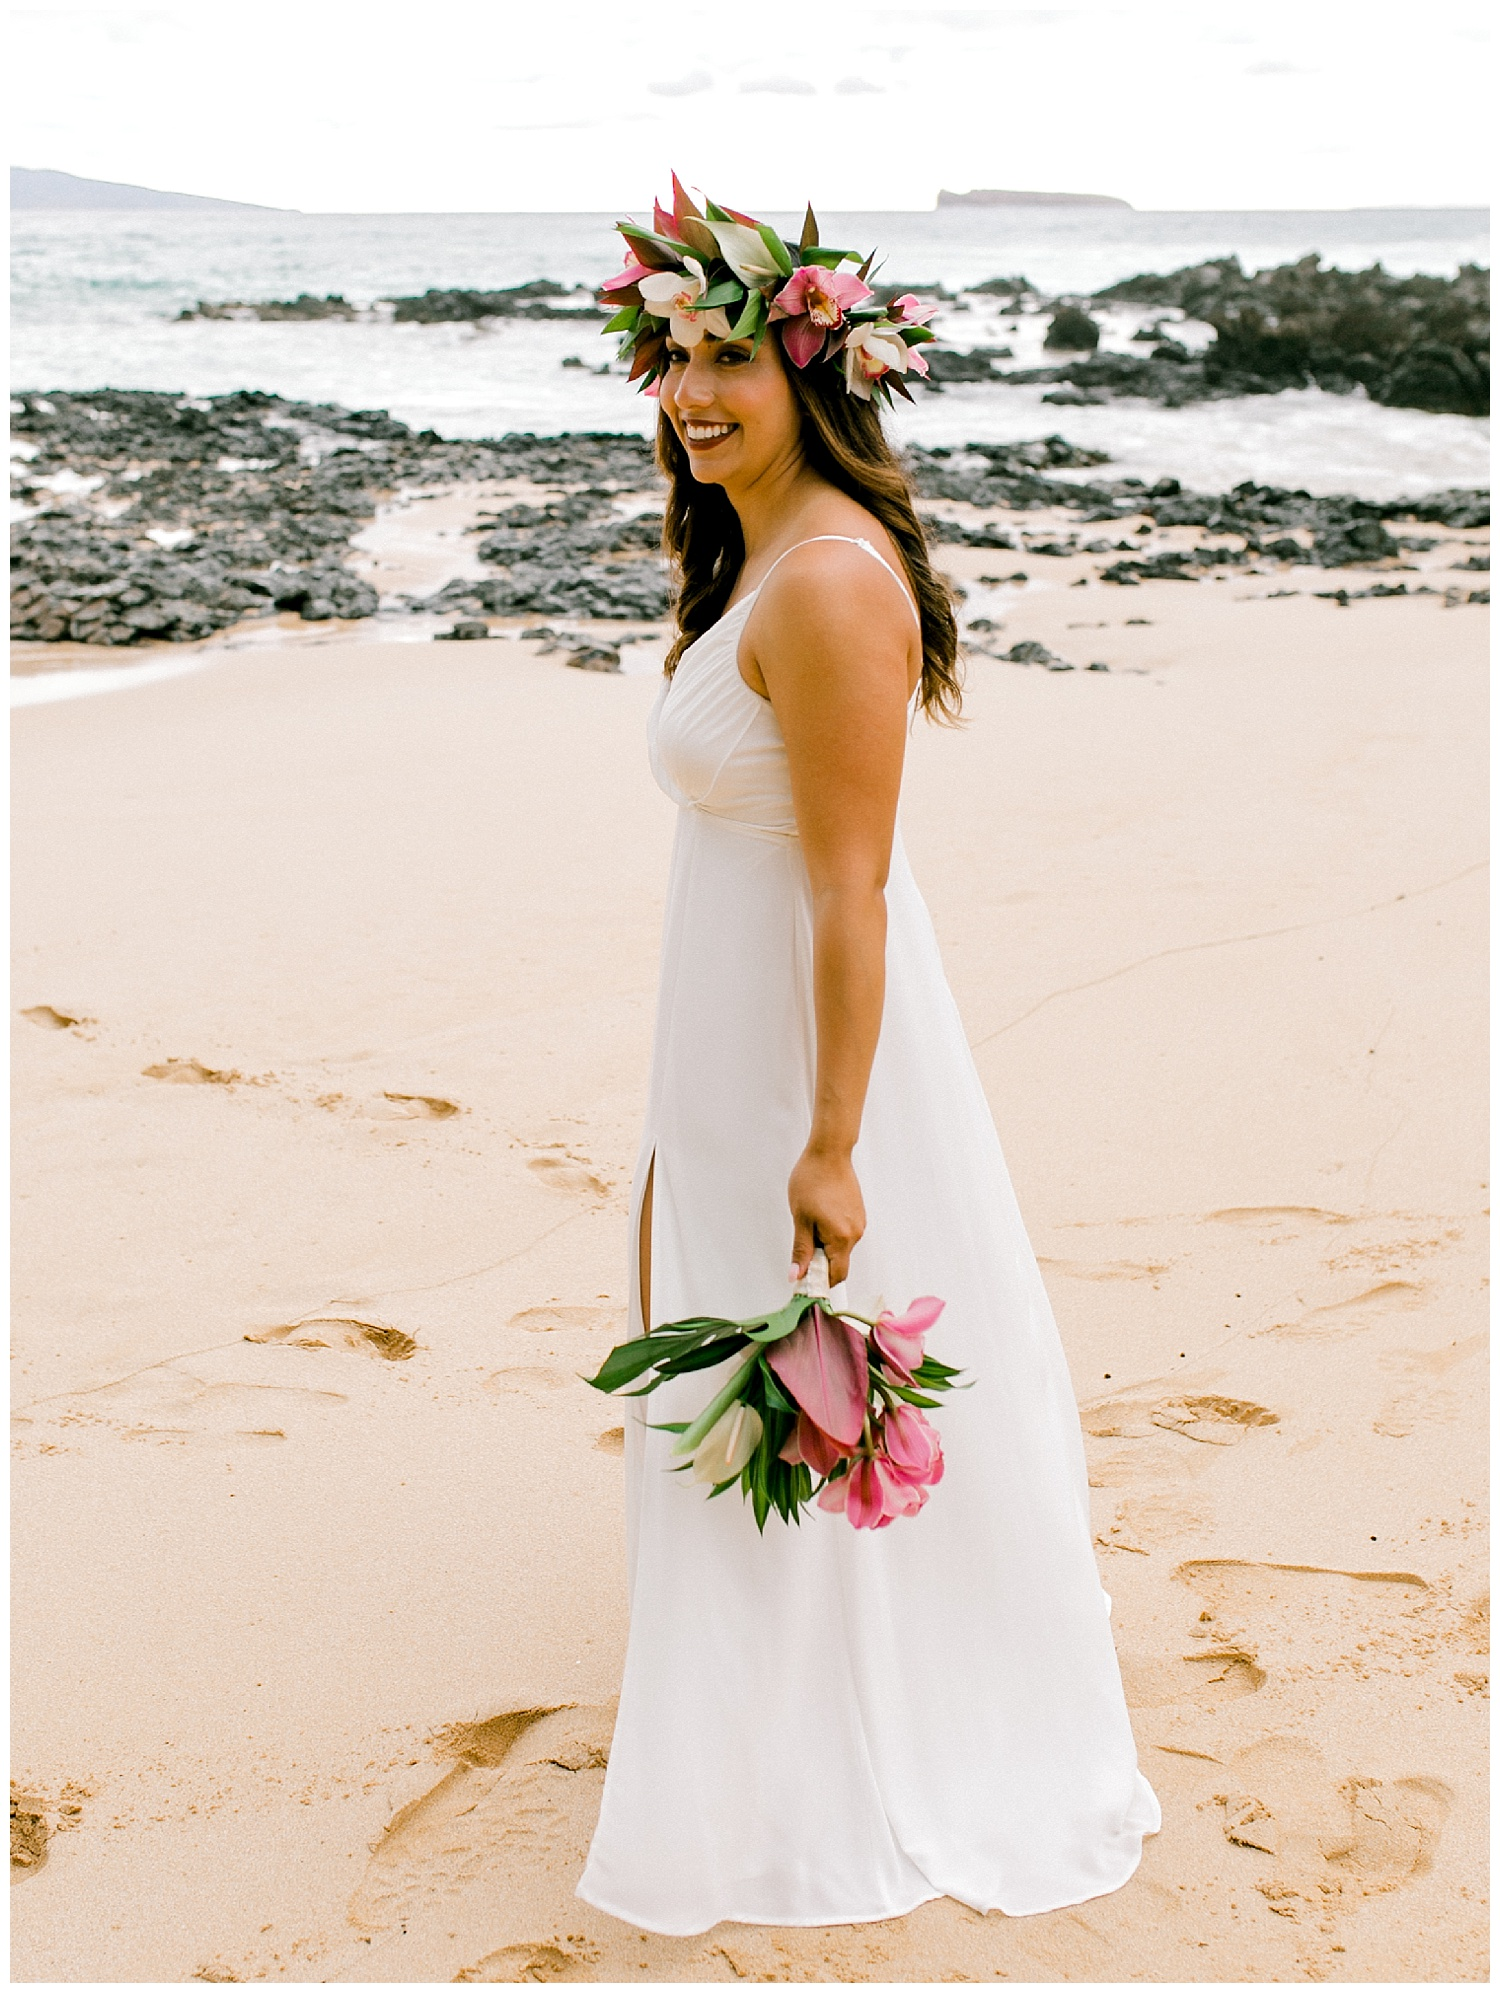 Maui-Elopement-Photography-Paipu-Beach-Maui_0091.jpg